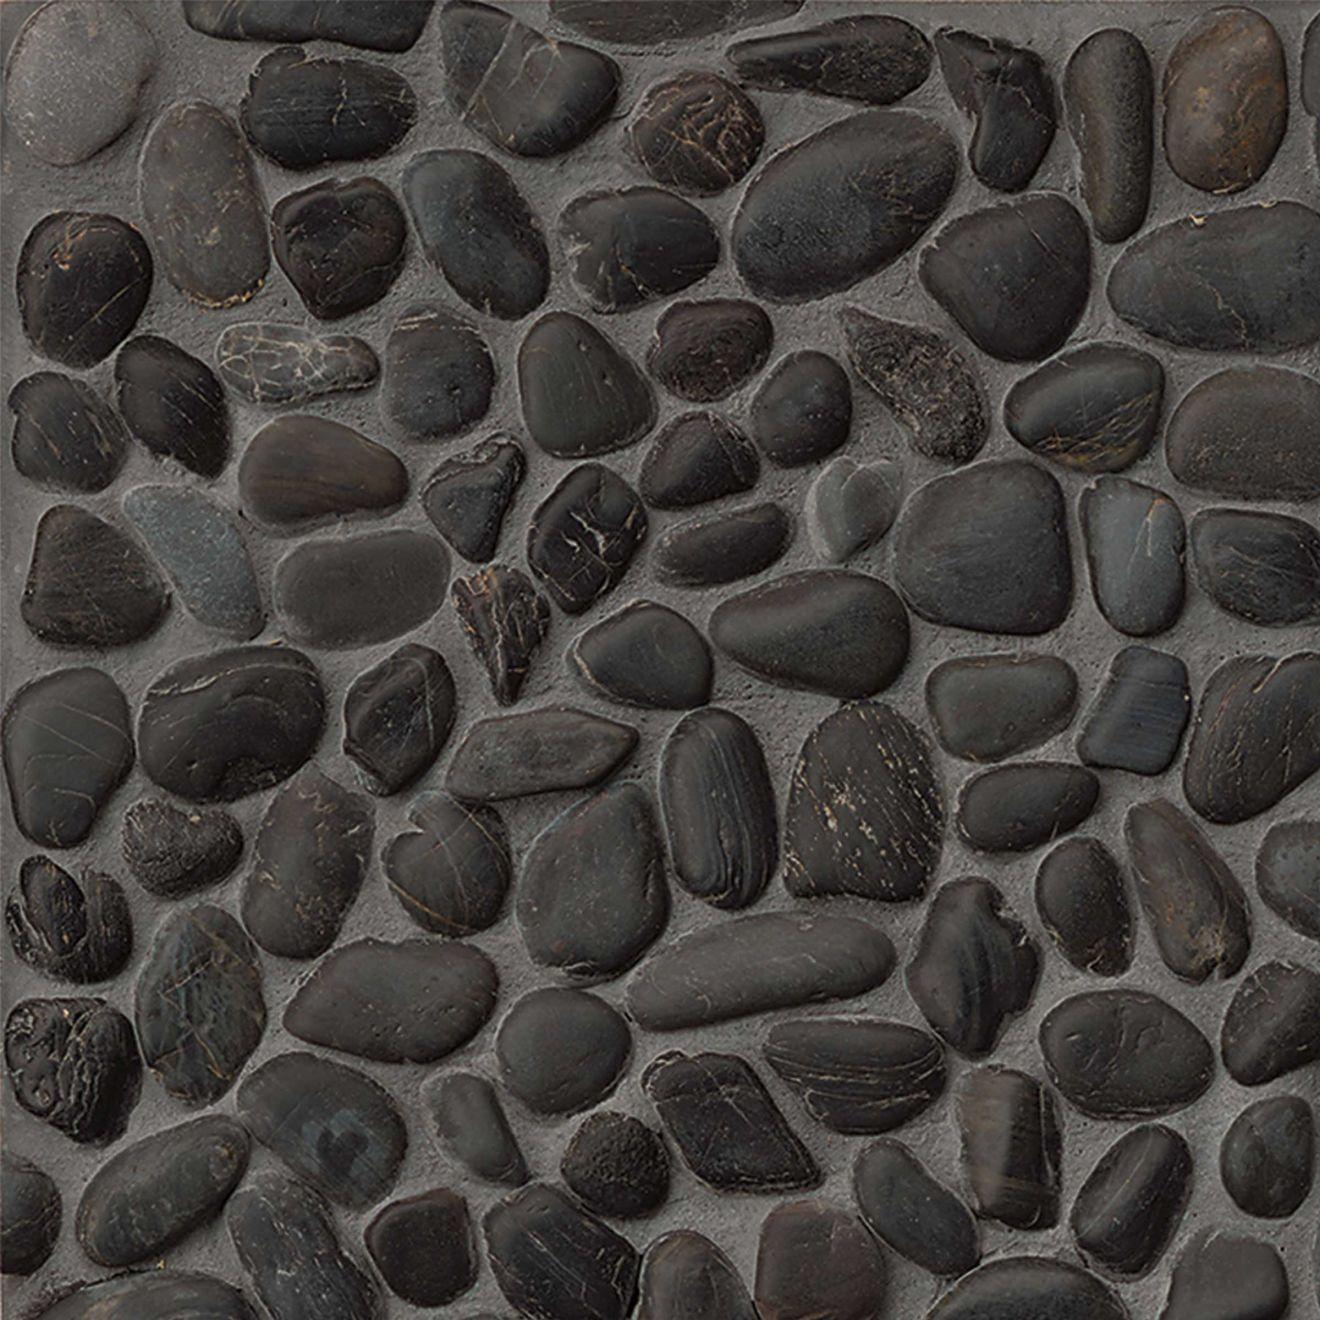 Hemisphere Polished Pebble Mosaic in Panther Black